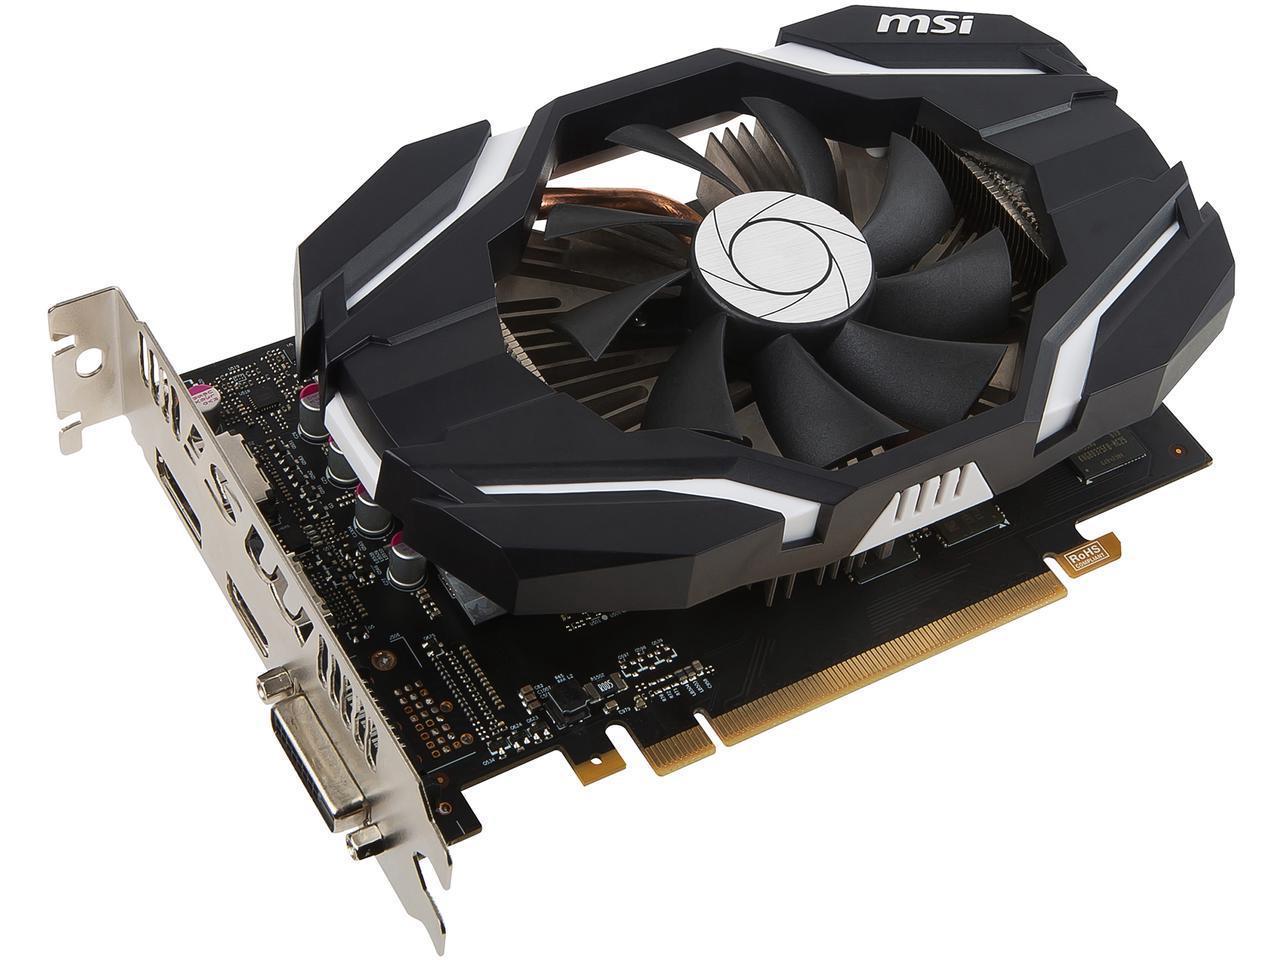 EVGA GeForce GTX 1060 GAMING, ACX 2.0 (Single Fan), 6GB GDDR5, DX12 OSD Support (PXOC),6.8 Inches $230 AC